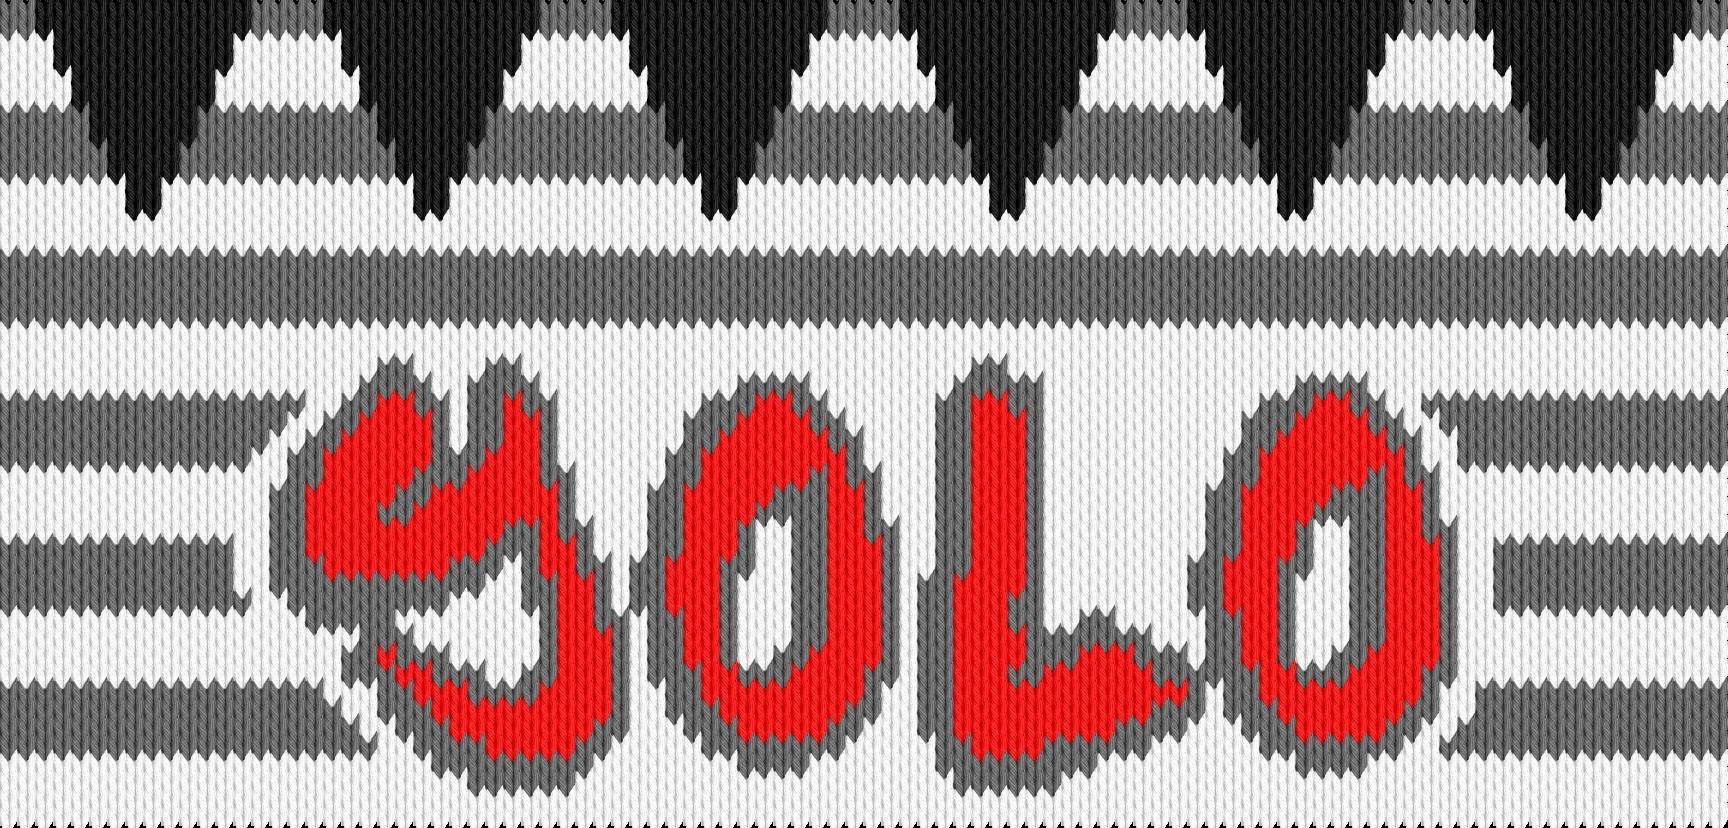 Knitting motif chart, Yolo kids cap 2